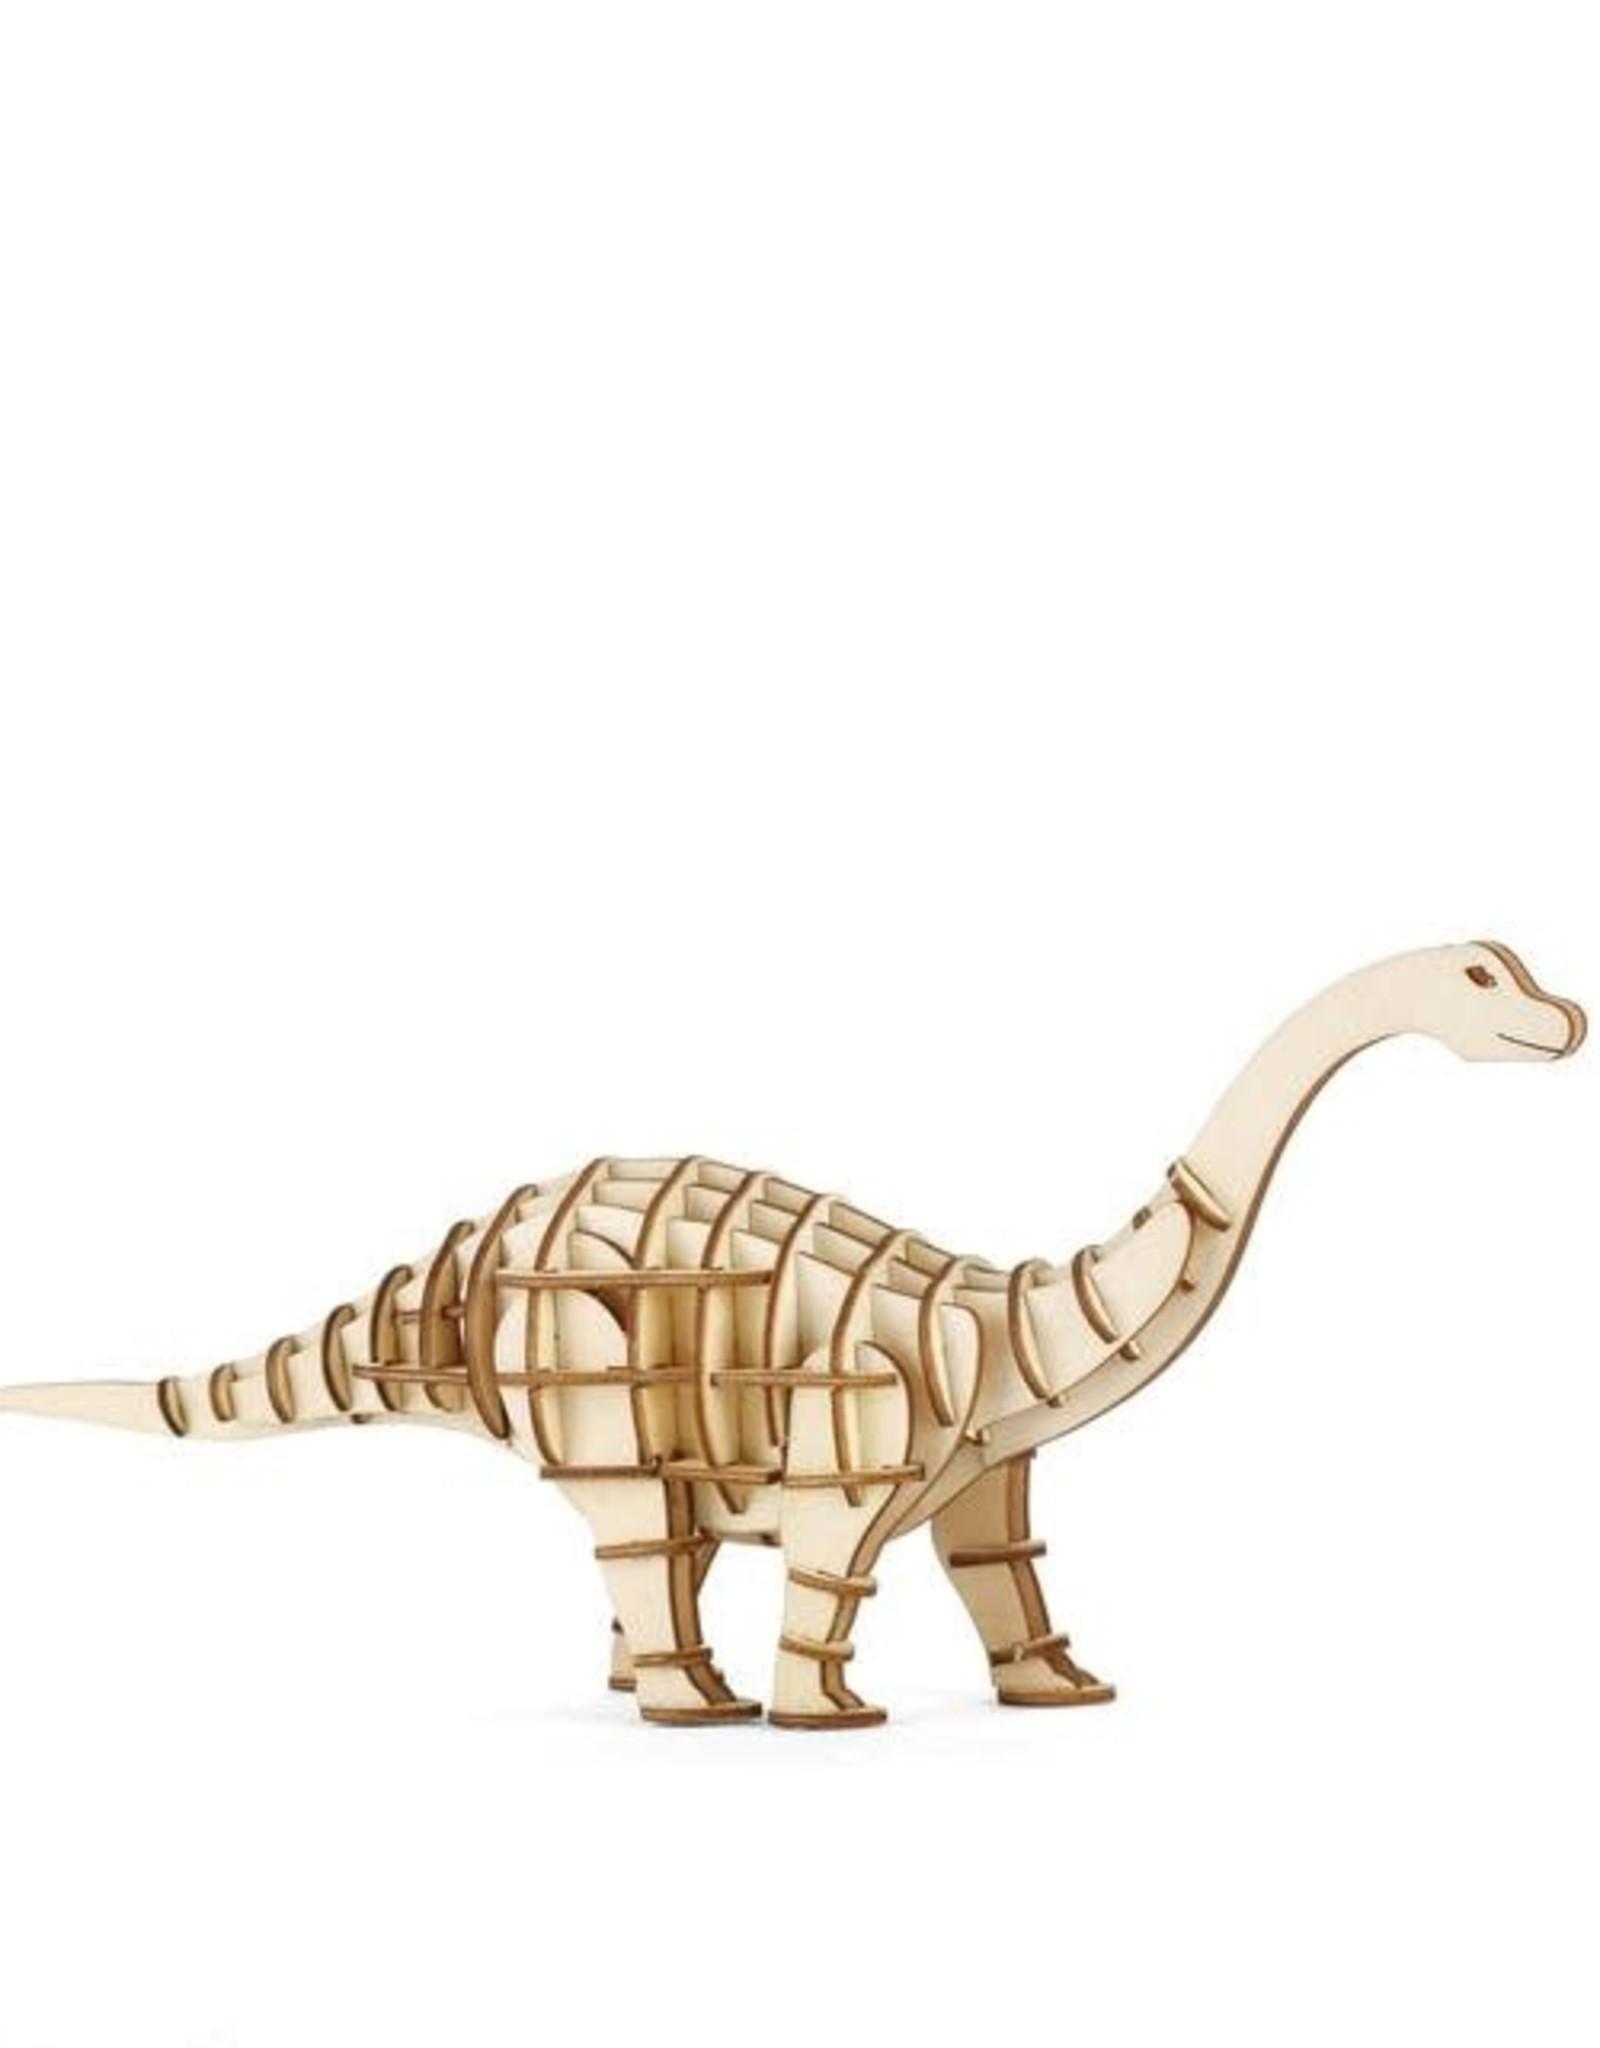 Kikkerland Apatosaurus 3D Wooden Puzzle